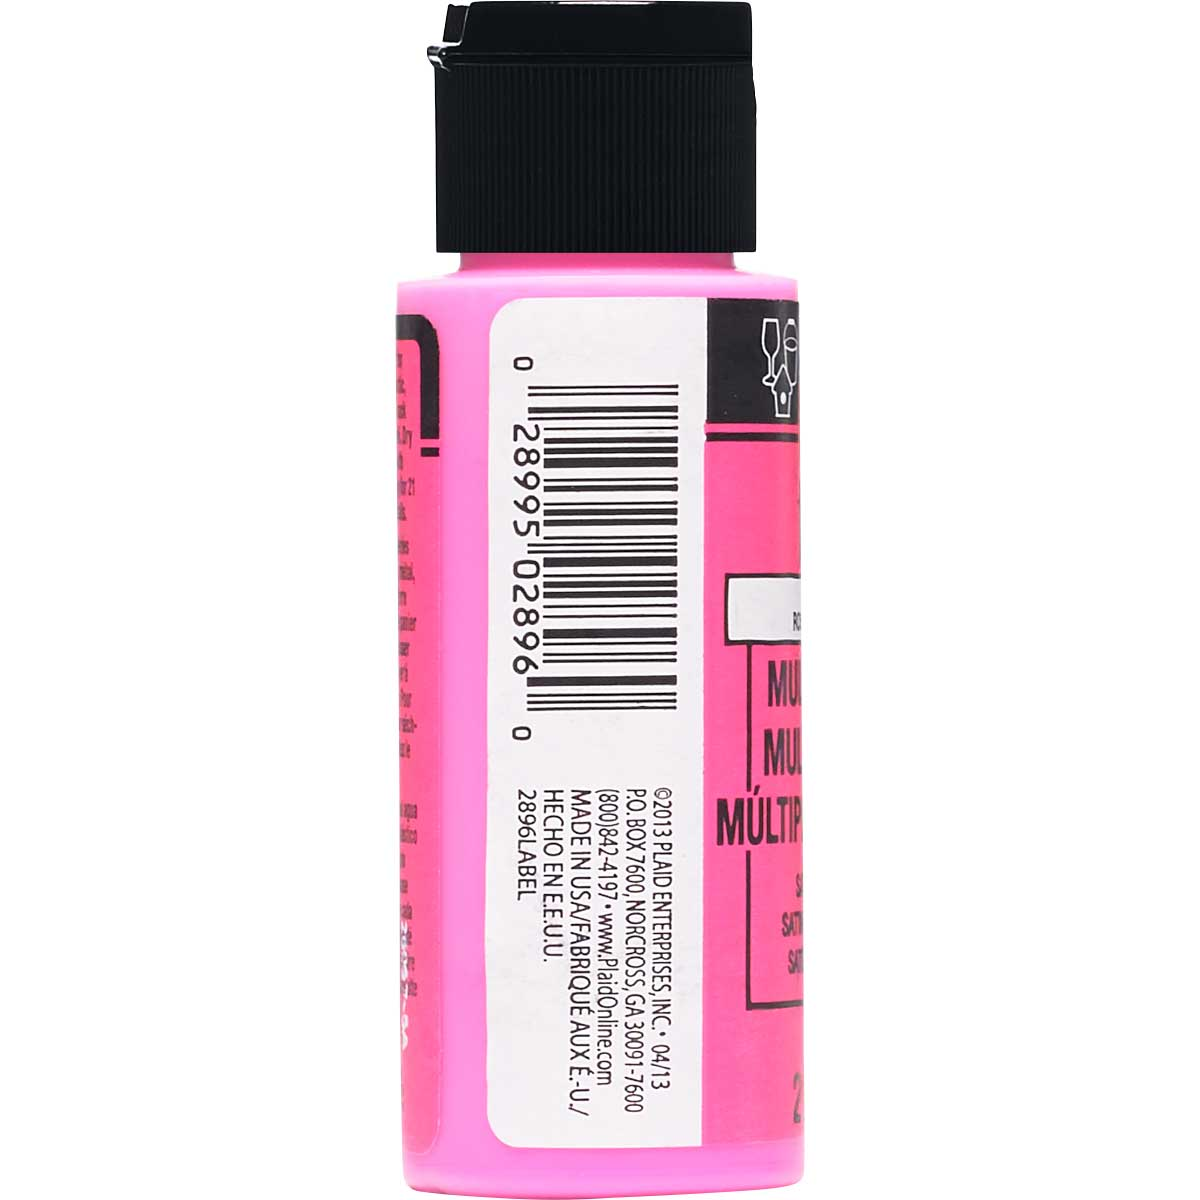 FolkArt ® Multi-Surface Satin Acrylic Paints - Bright Pink, 2 oz.